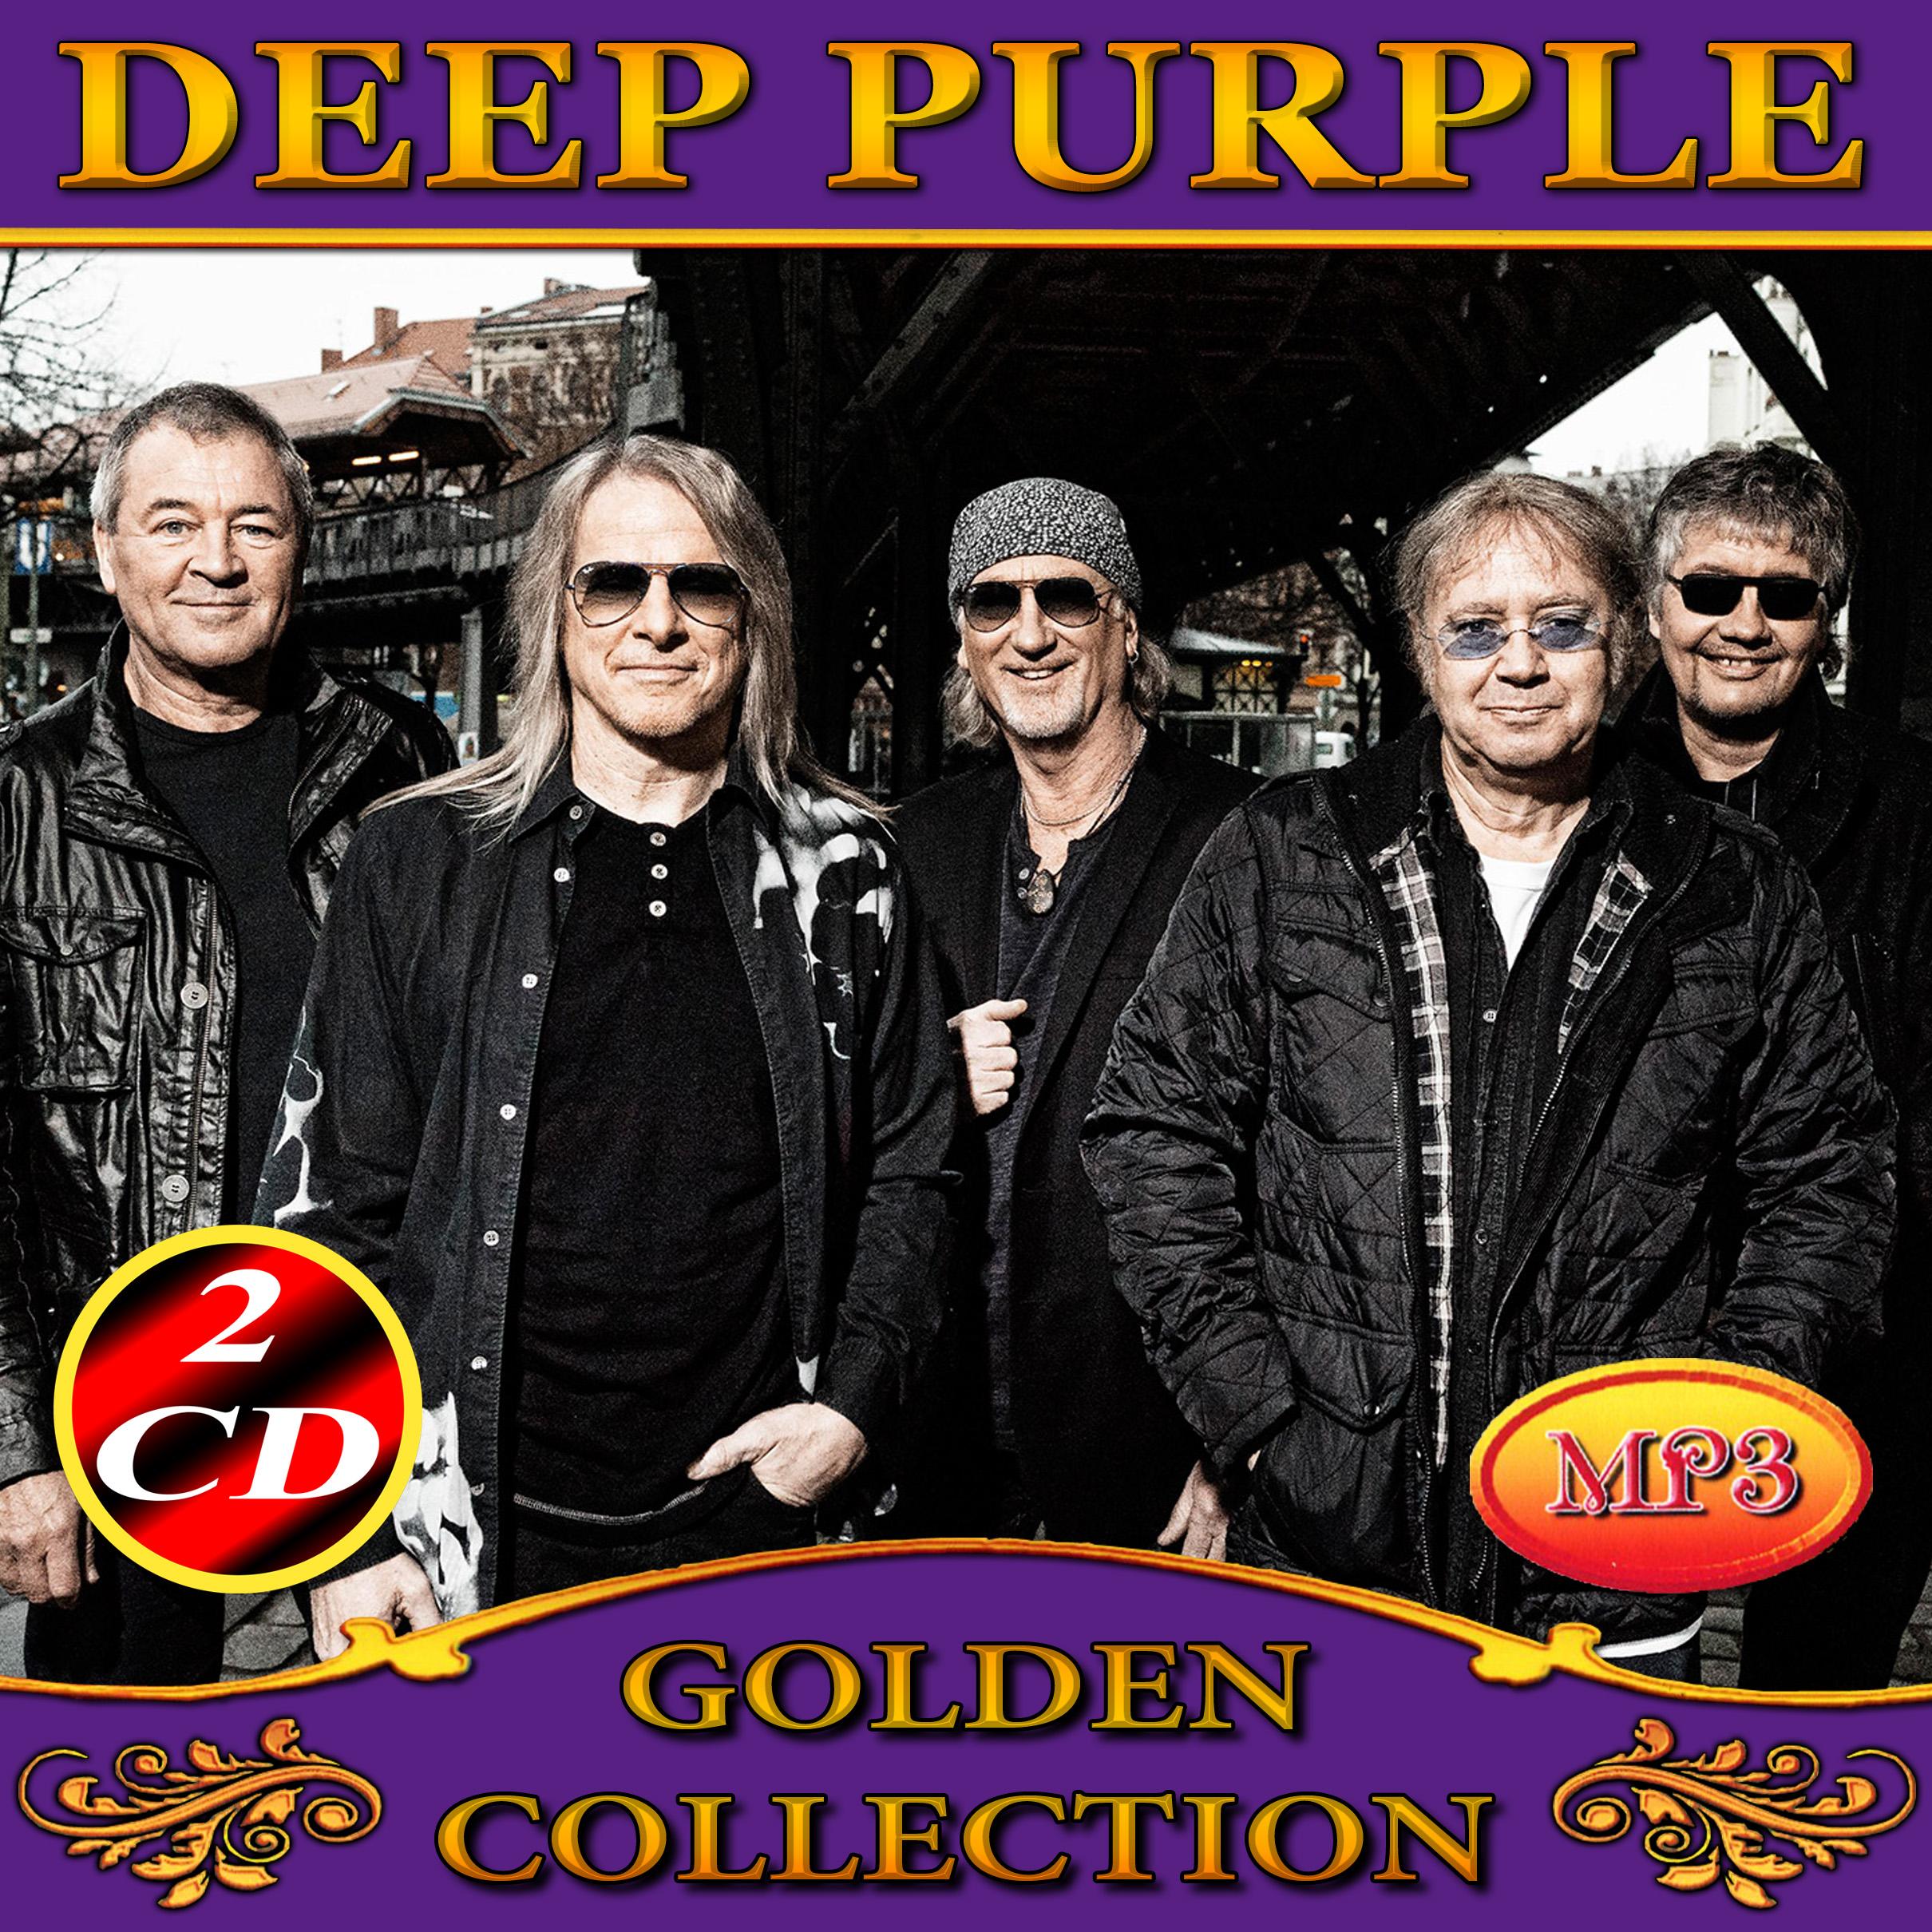 Deep Purple 2cd [mp3]